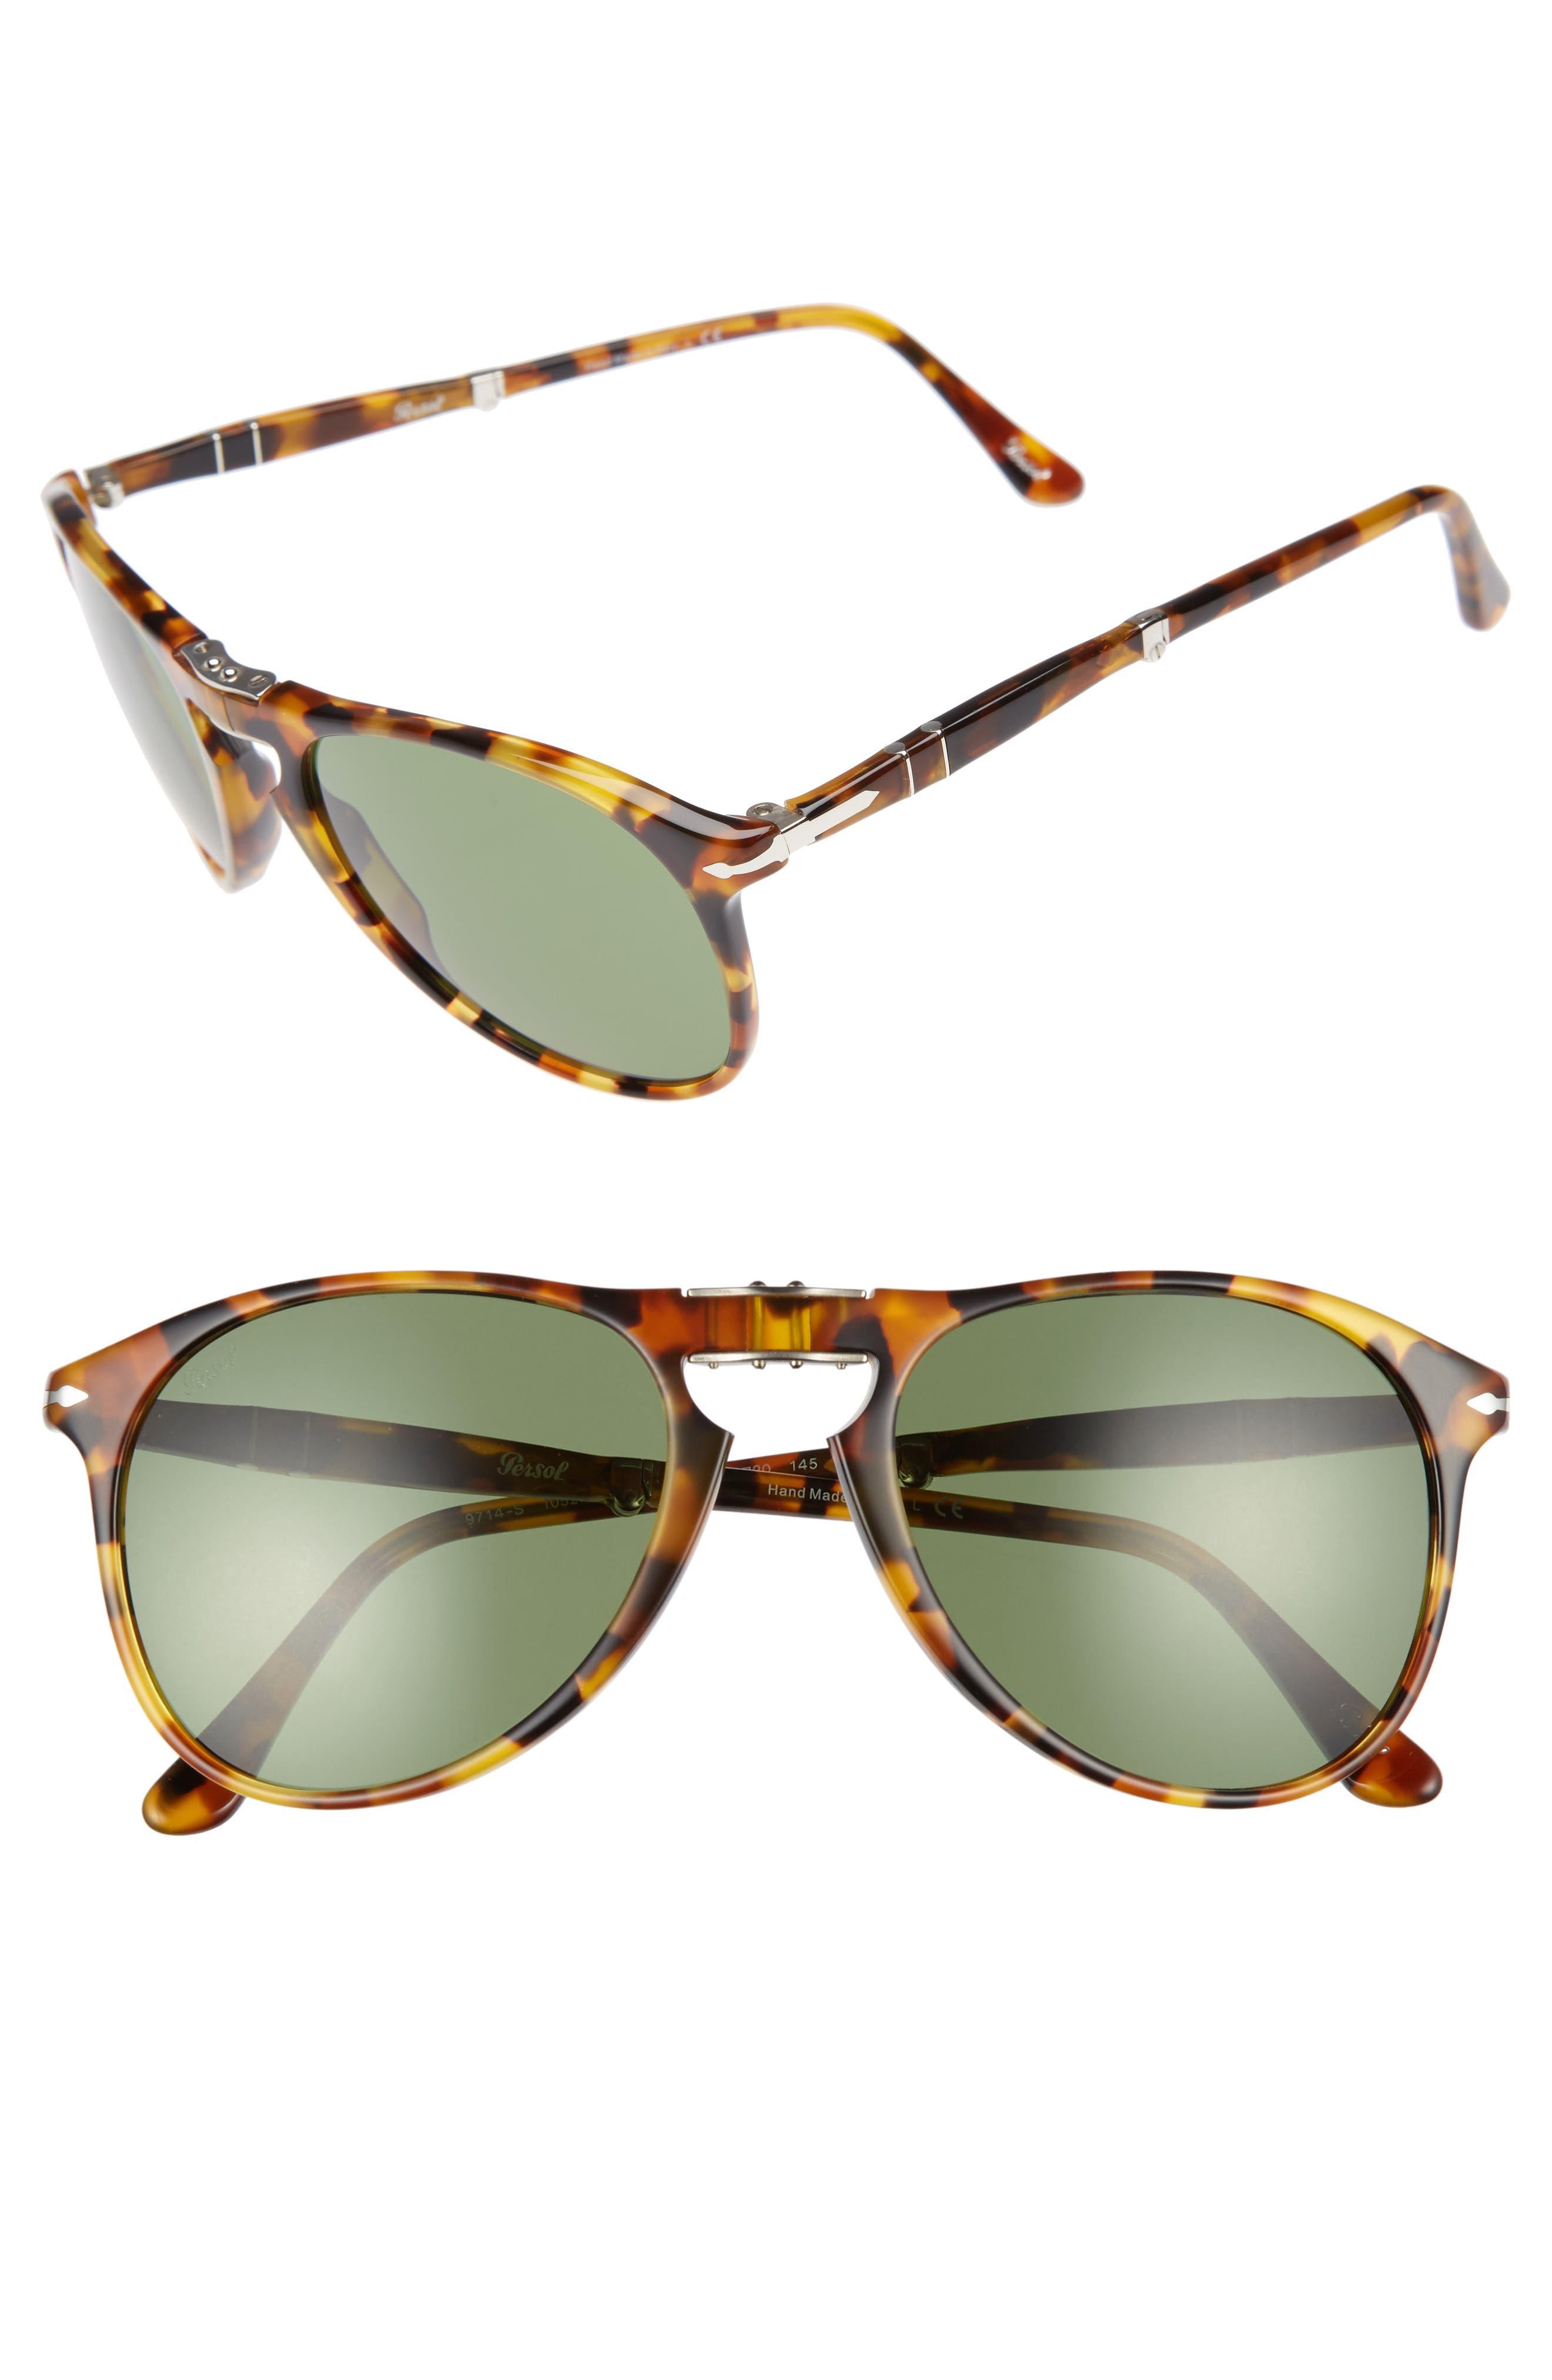 Persol Icona 55mm Polarized Folding Sunglasses